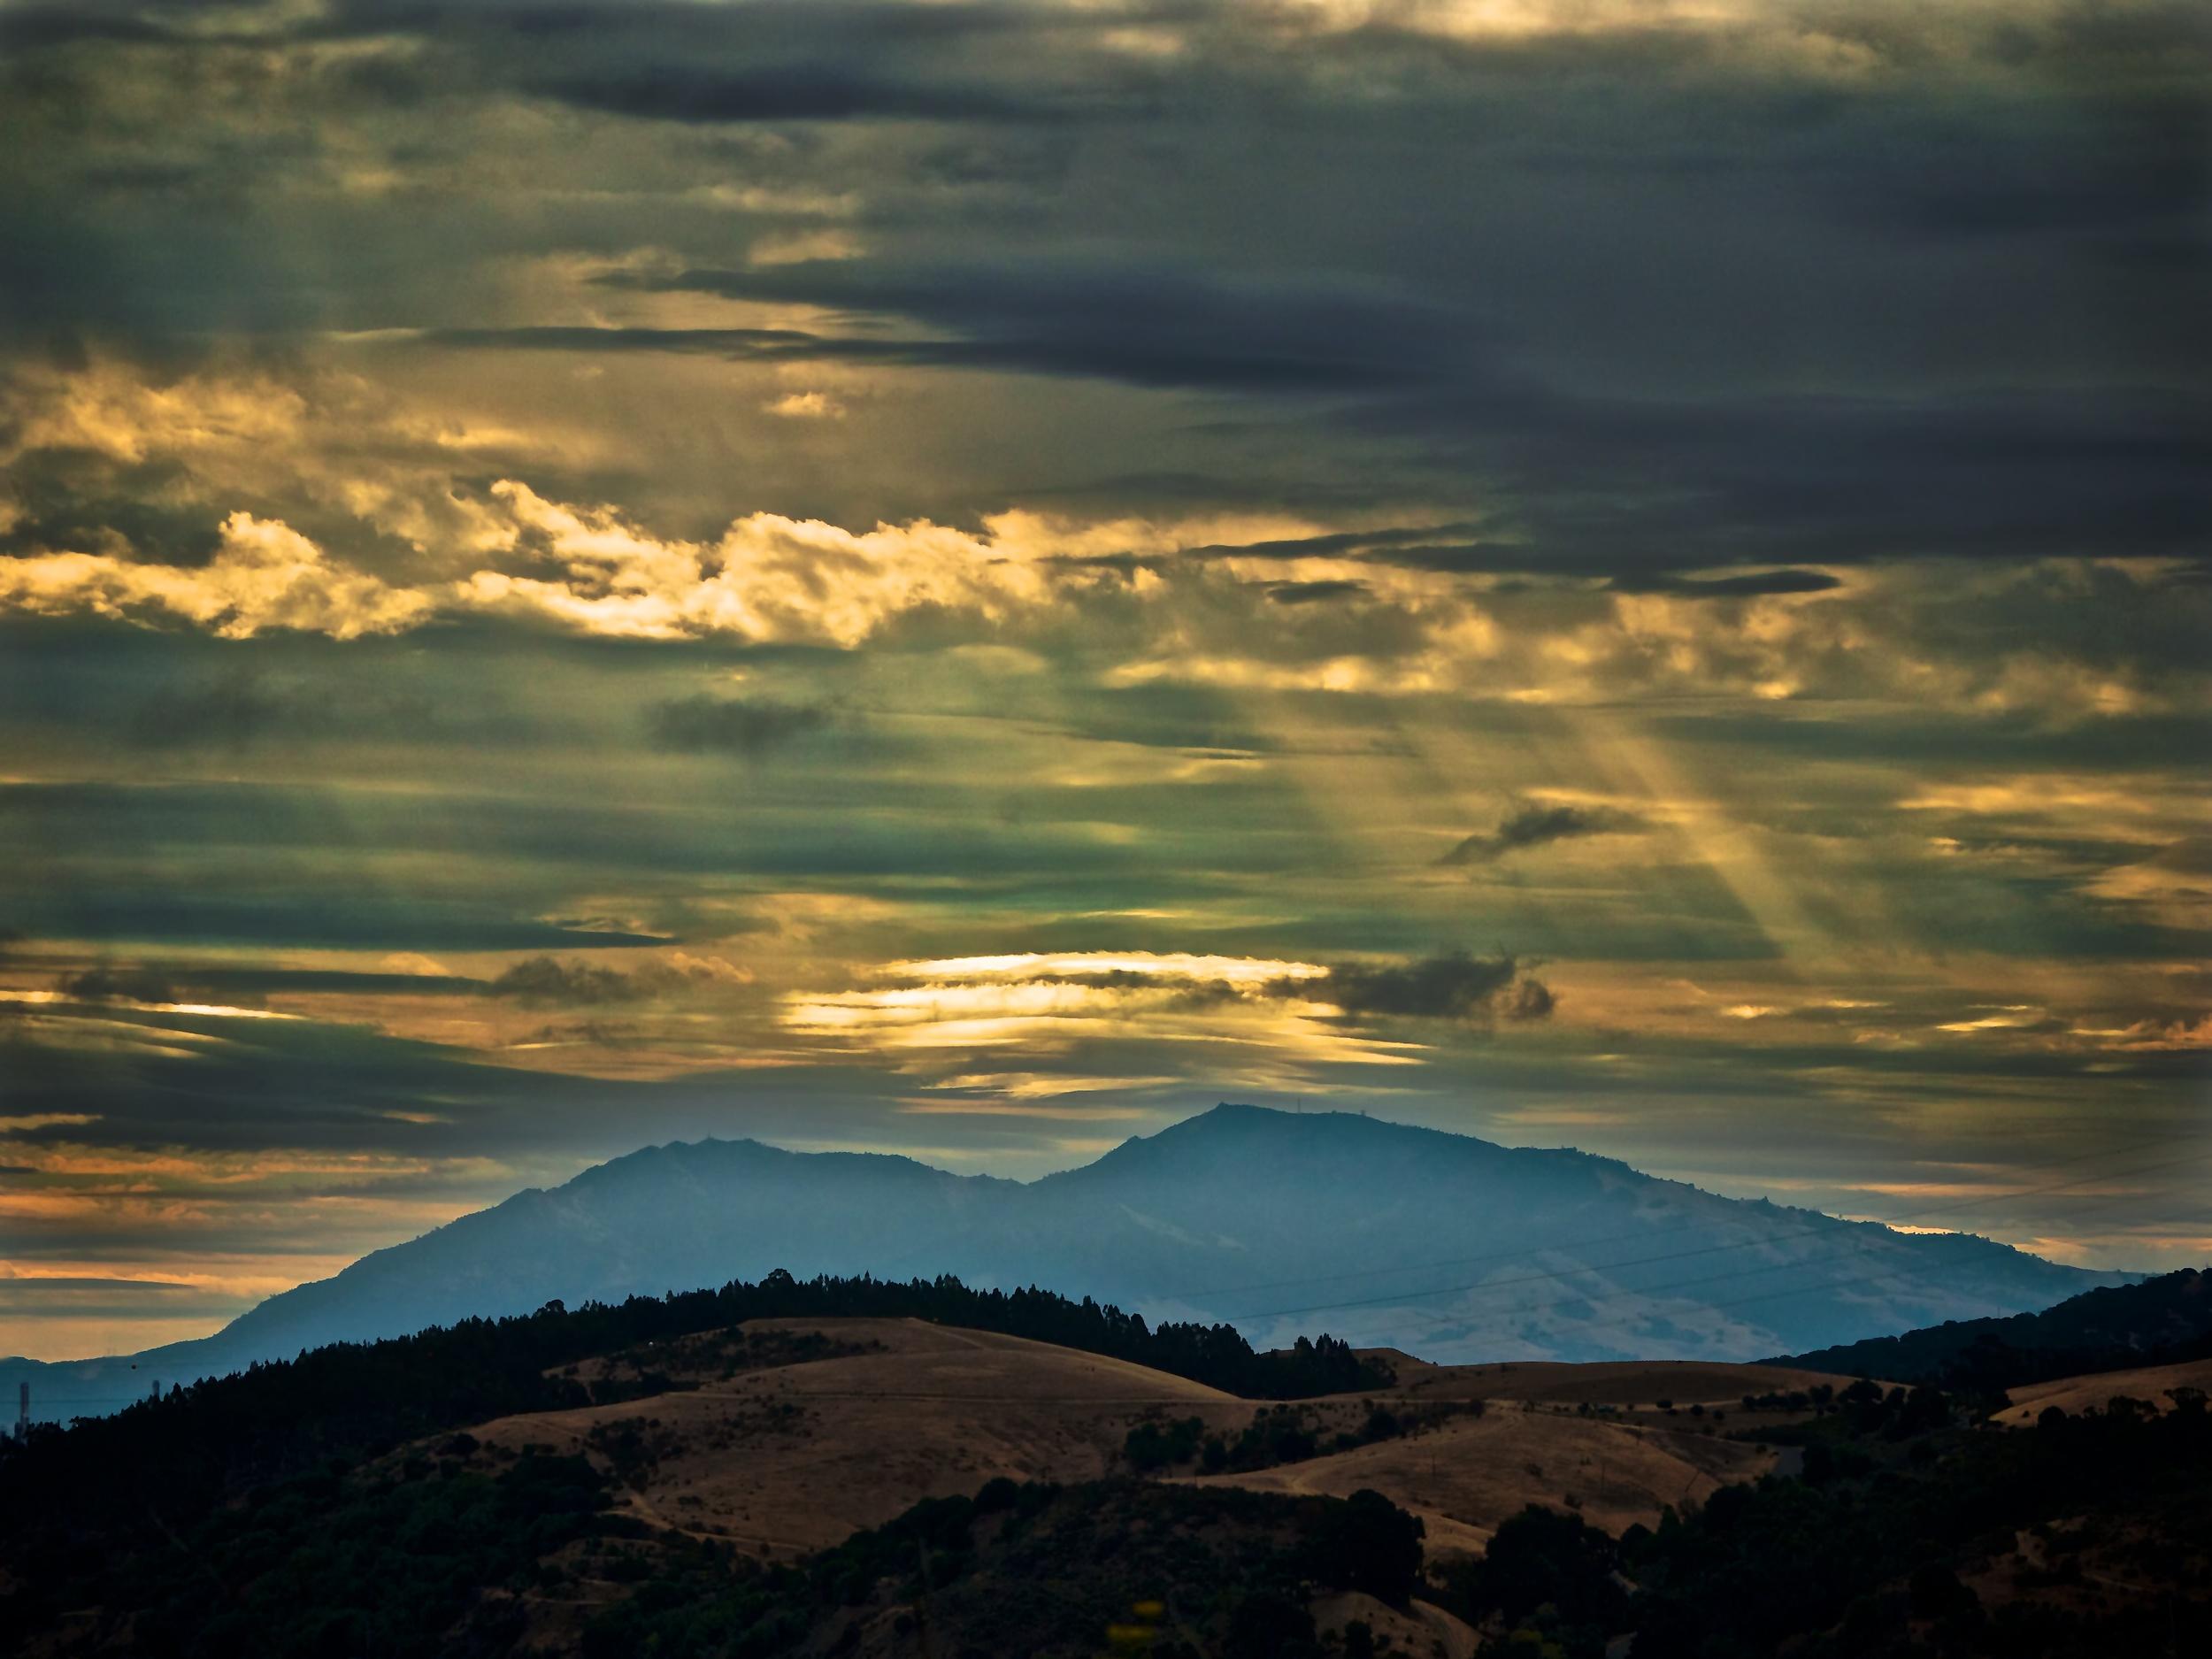 Sunlight streams through the clouds above Mt Diablo